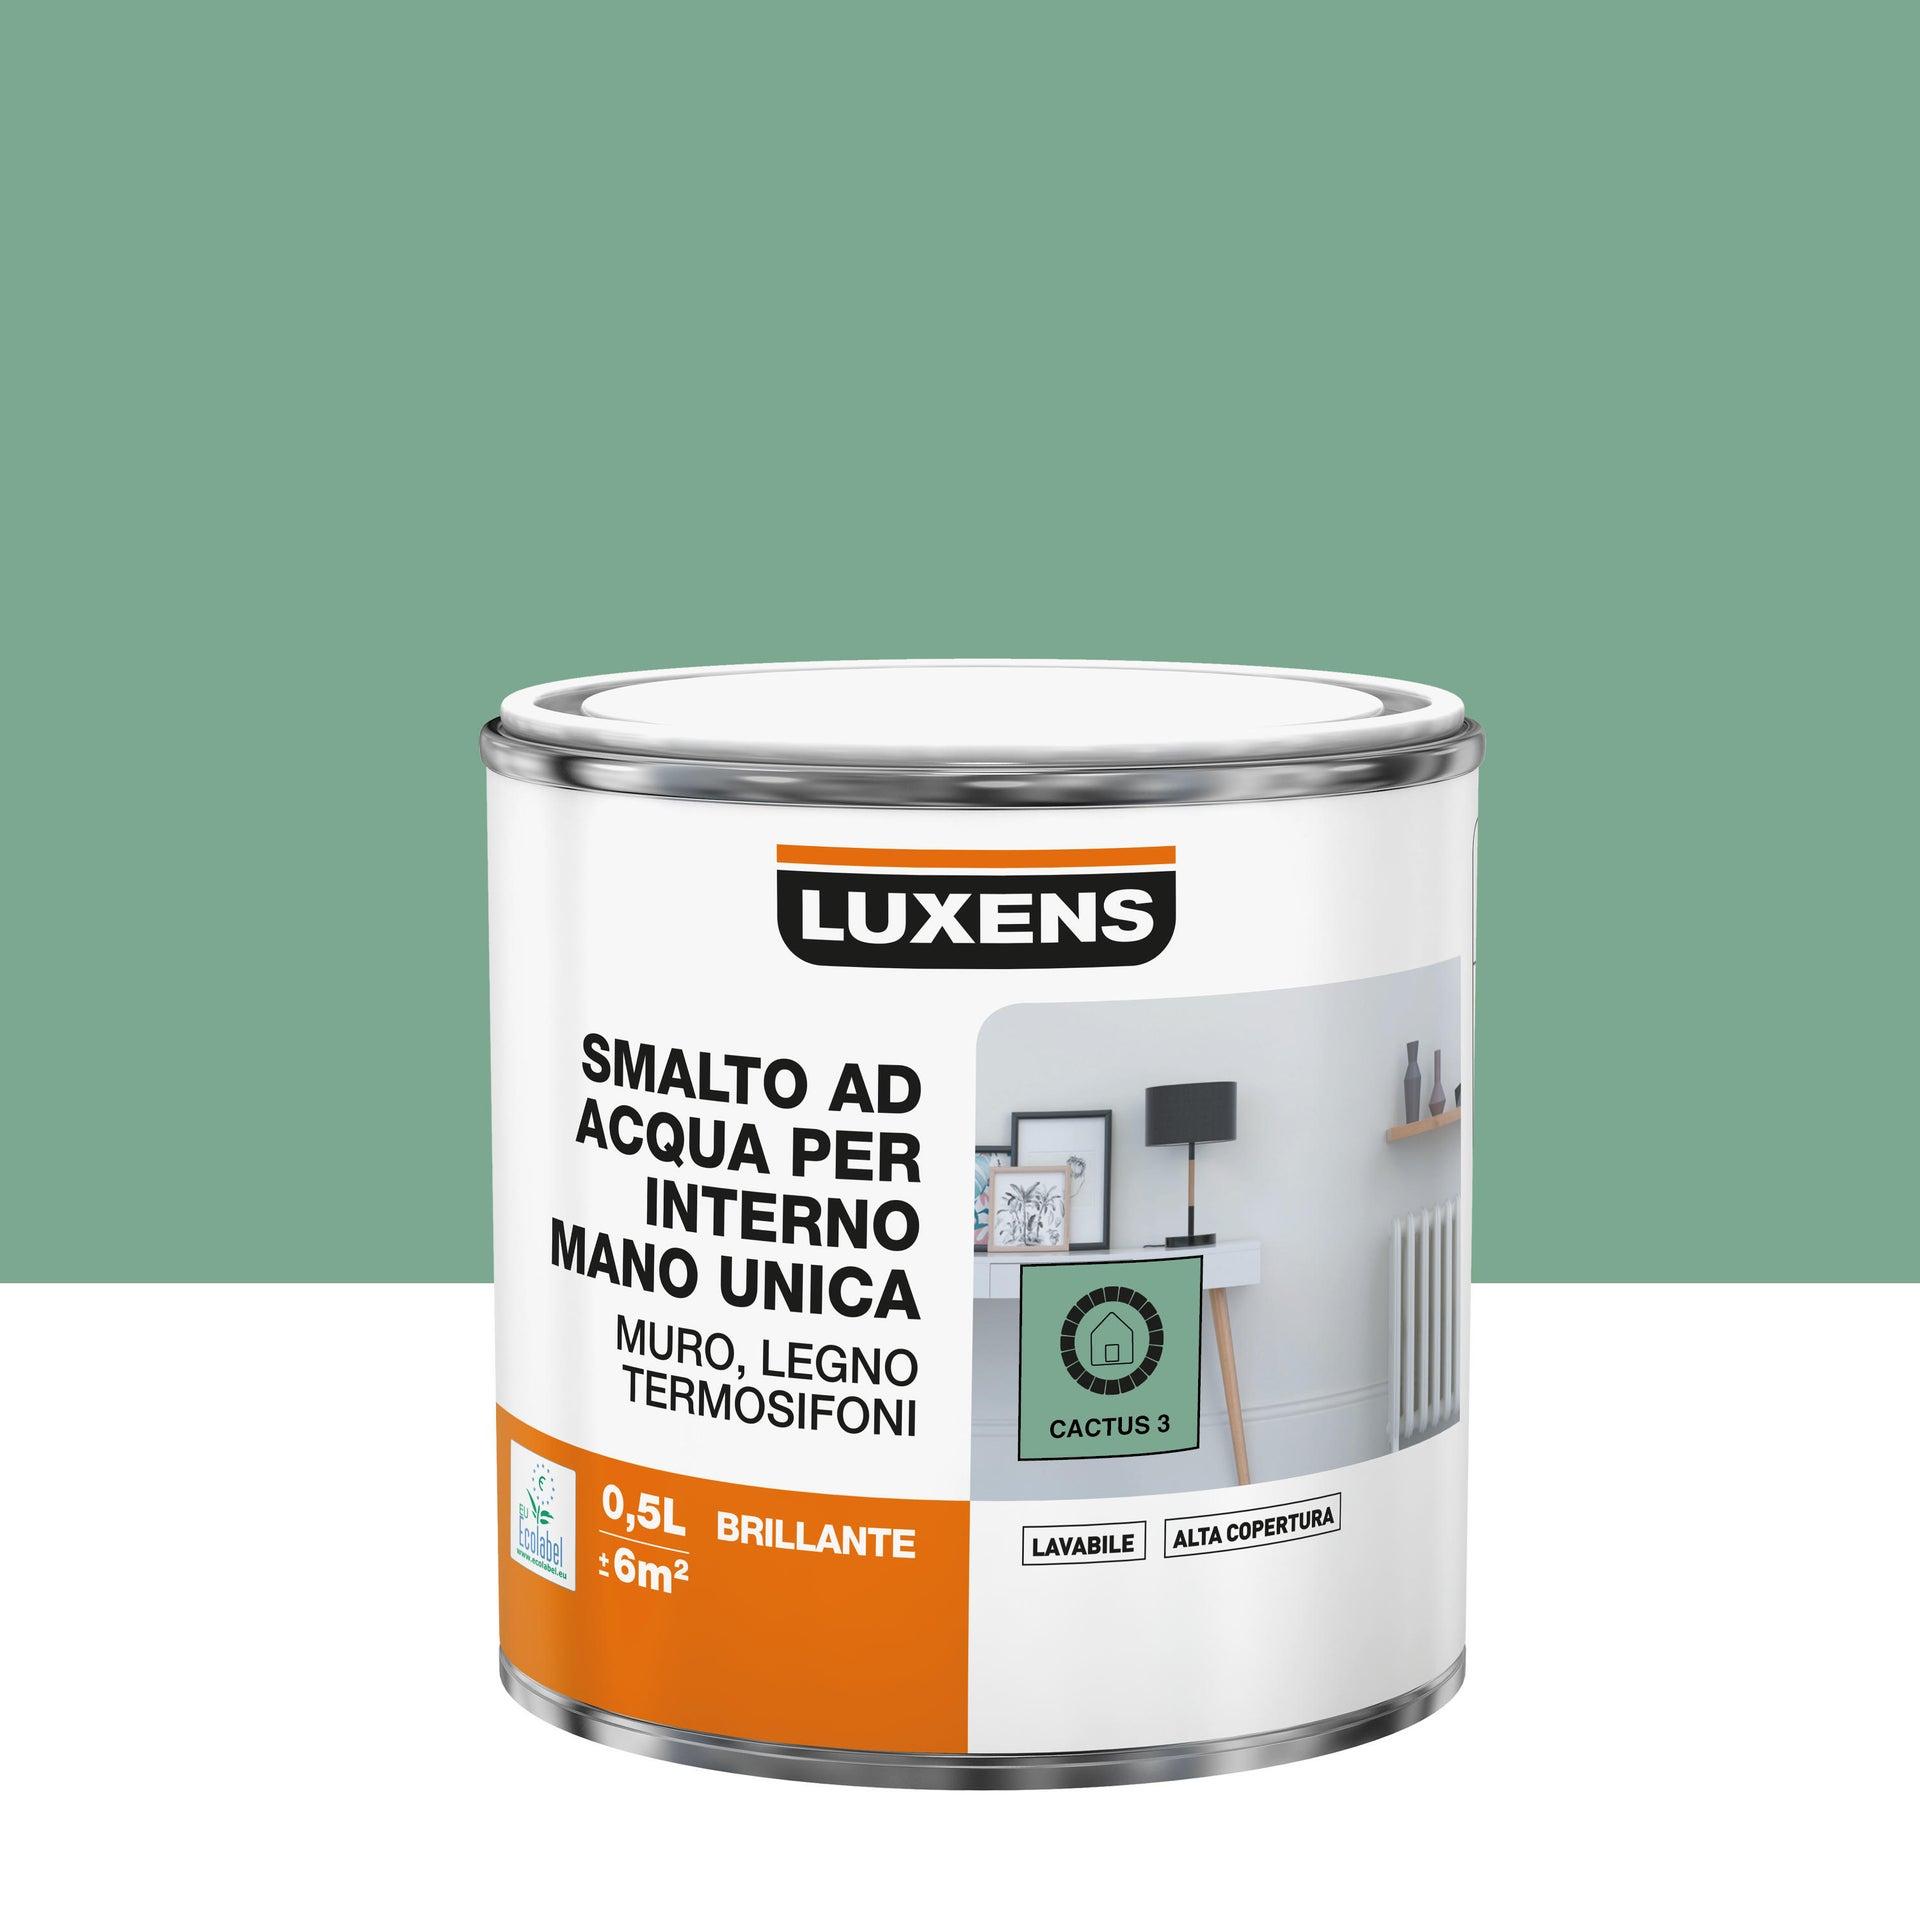 Vernice di finitura LUXENS Manounica base acqua verde cactus 3 lucido 0.5 L - 3